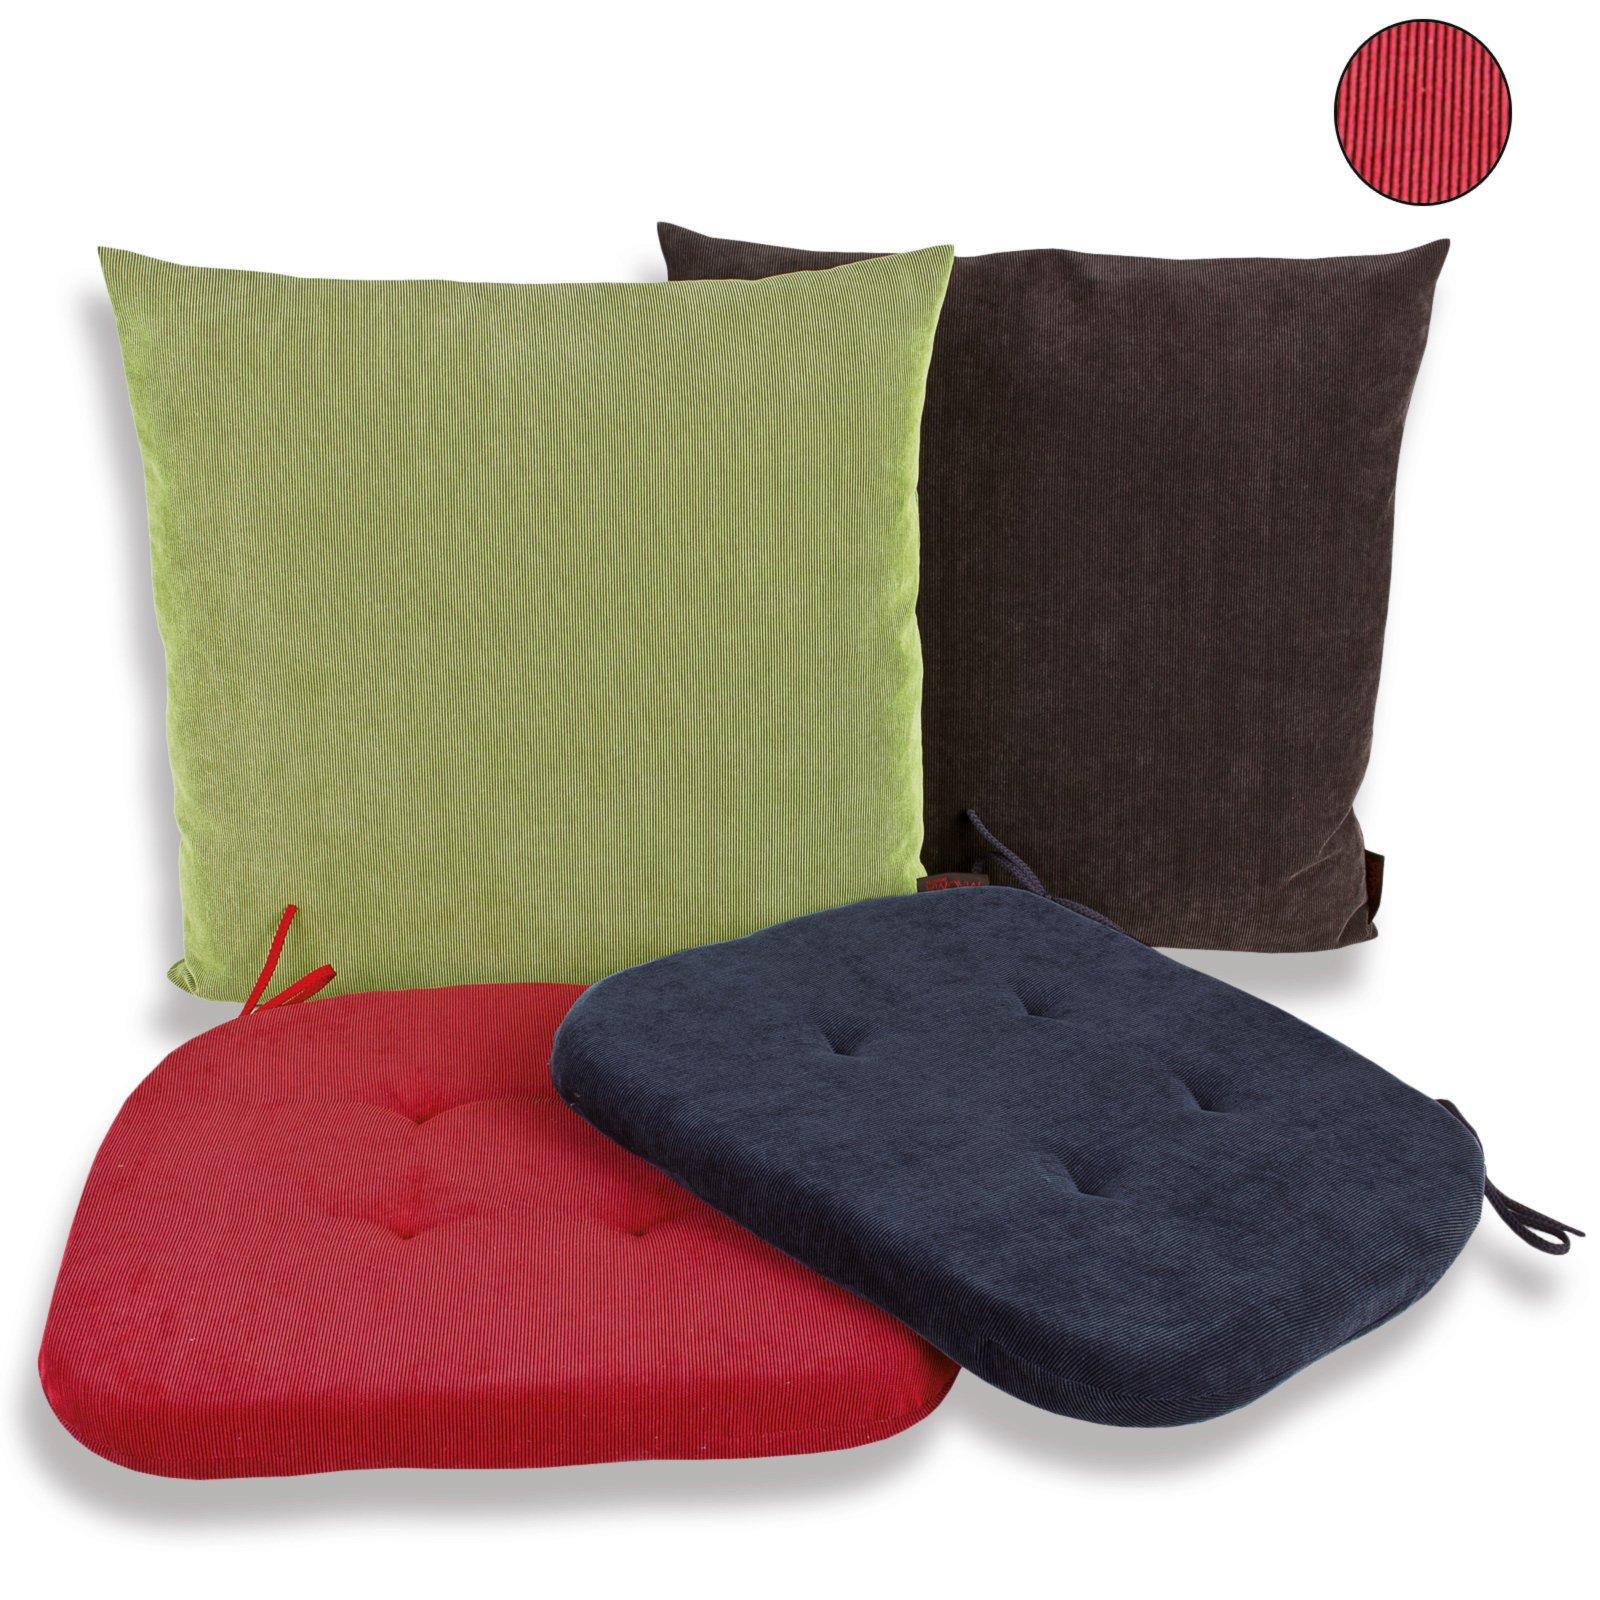 stuhlkissen trio weinrot cord 41x41 cm stuhl. Black Bedroom Furniture Sets. Home Design Ideas